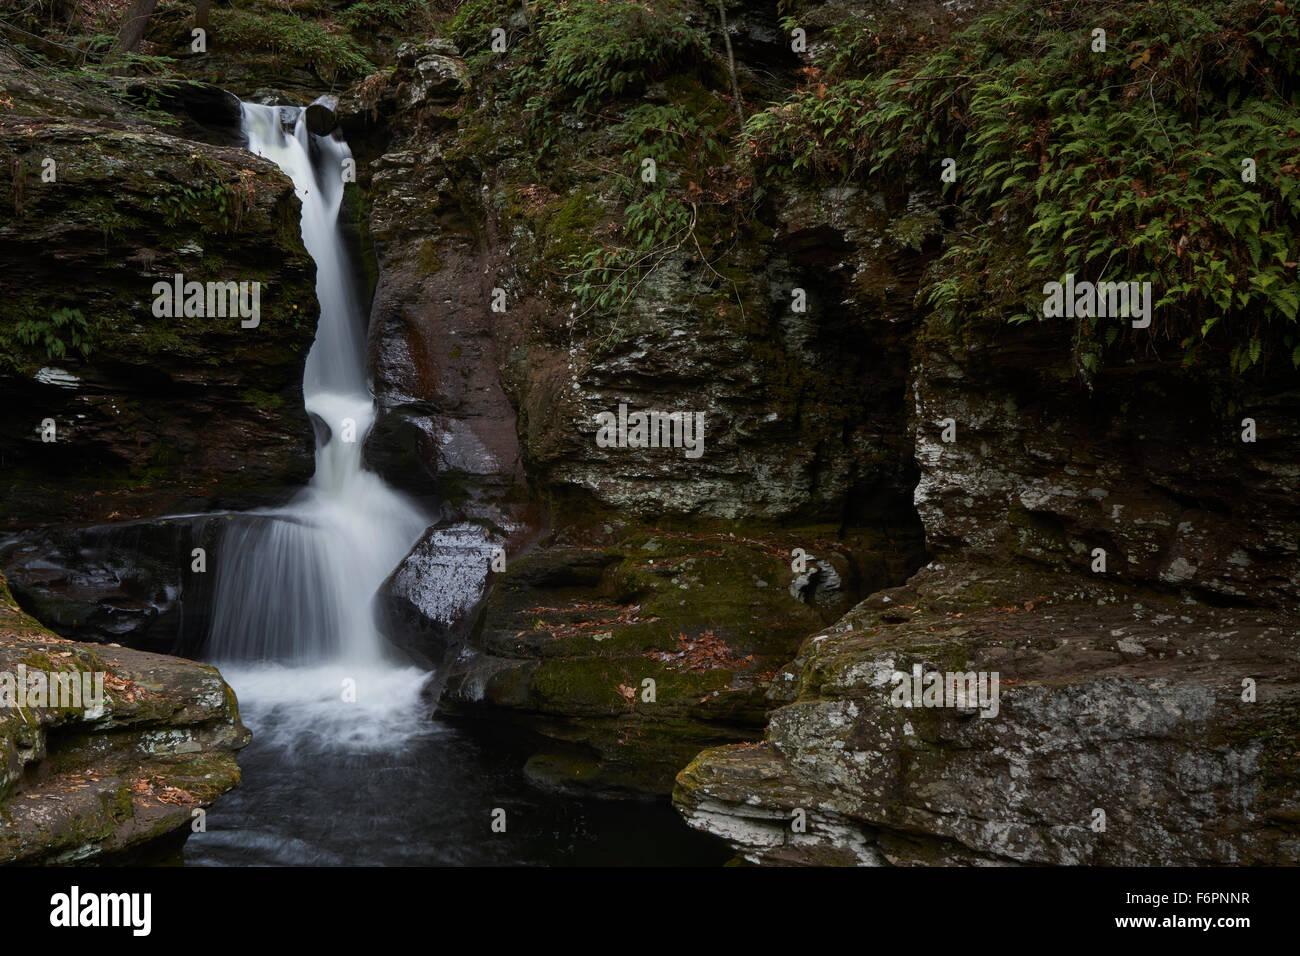 Adams Falls, Ricketts Glen State Park, Benton, Pennsylvania, USA Stock Photo